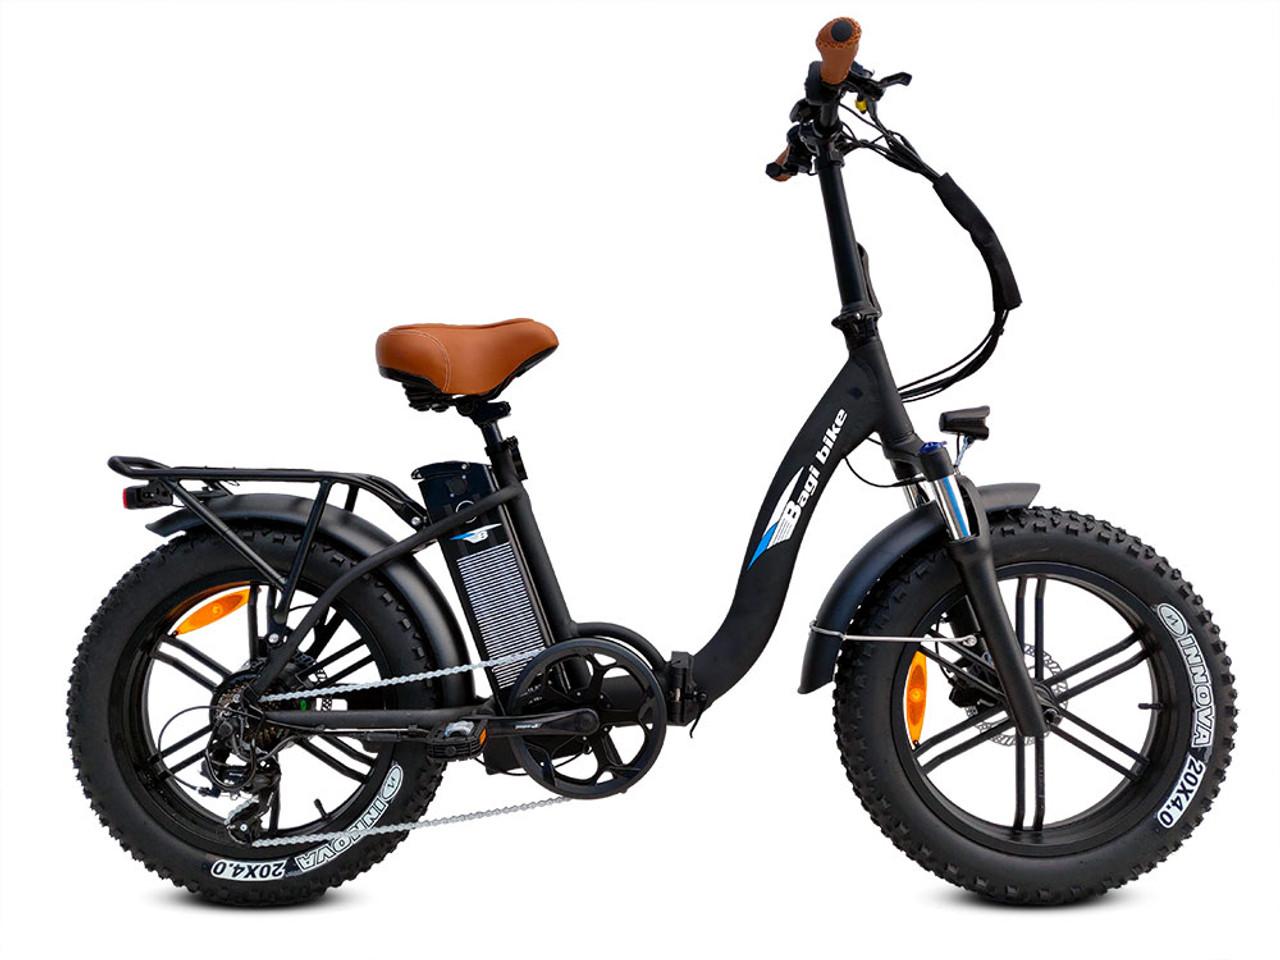 Parts Throttle Grip 1 Pair Waterproof LCD display E-bike Electric bicycle